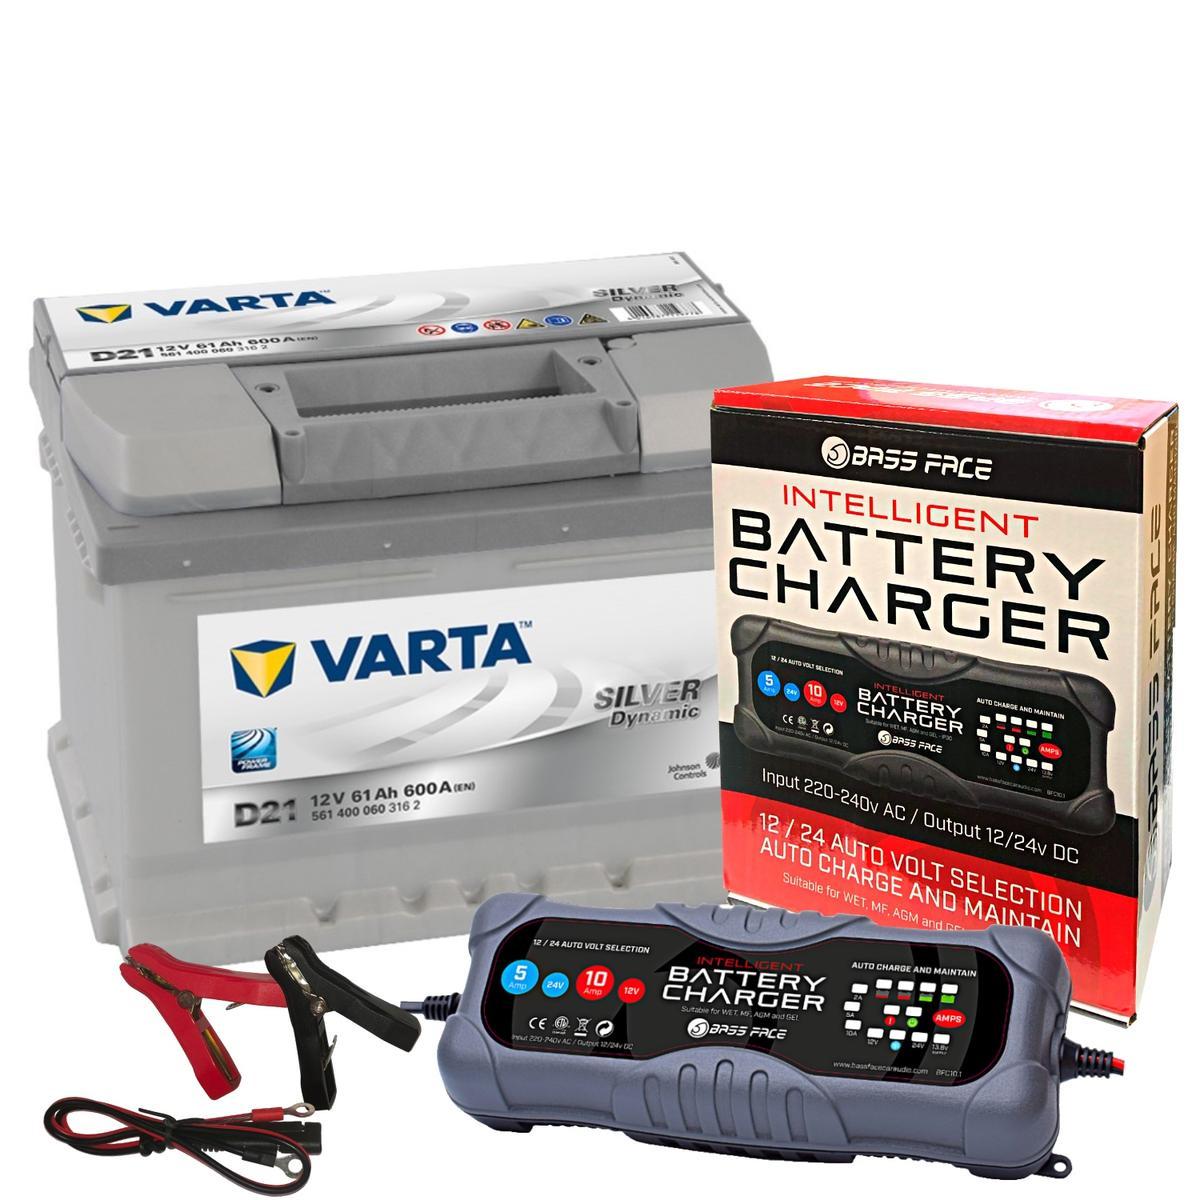 Varta D21 Ford Vaux VW Car Battery 12v 5 Year 075 61Ah 600CCA W/ 10 Amp Charger